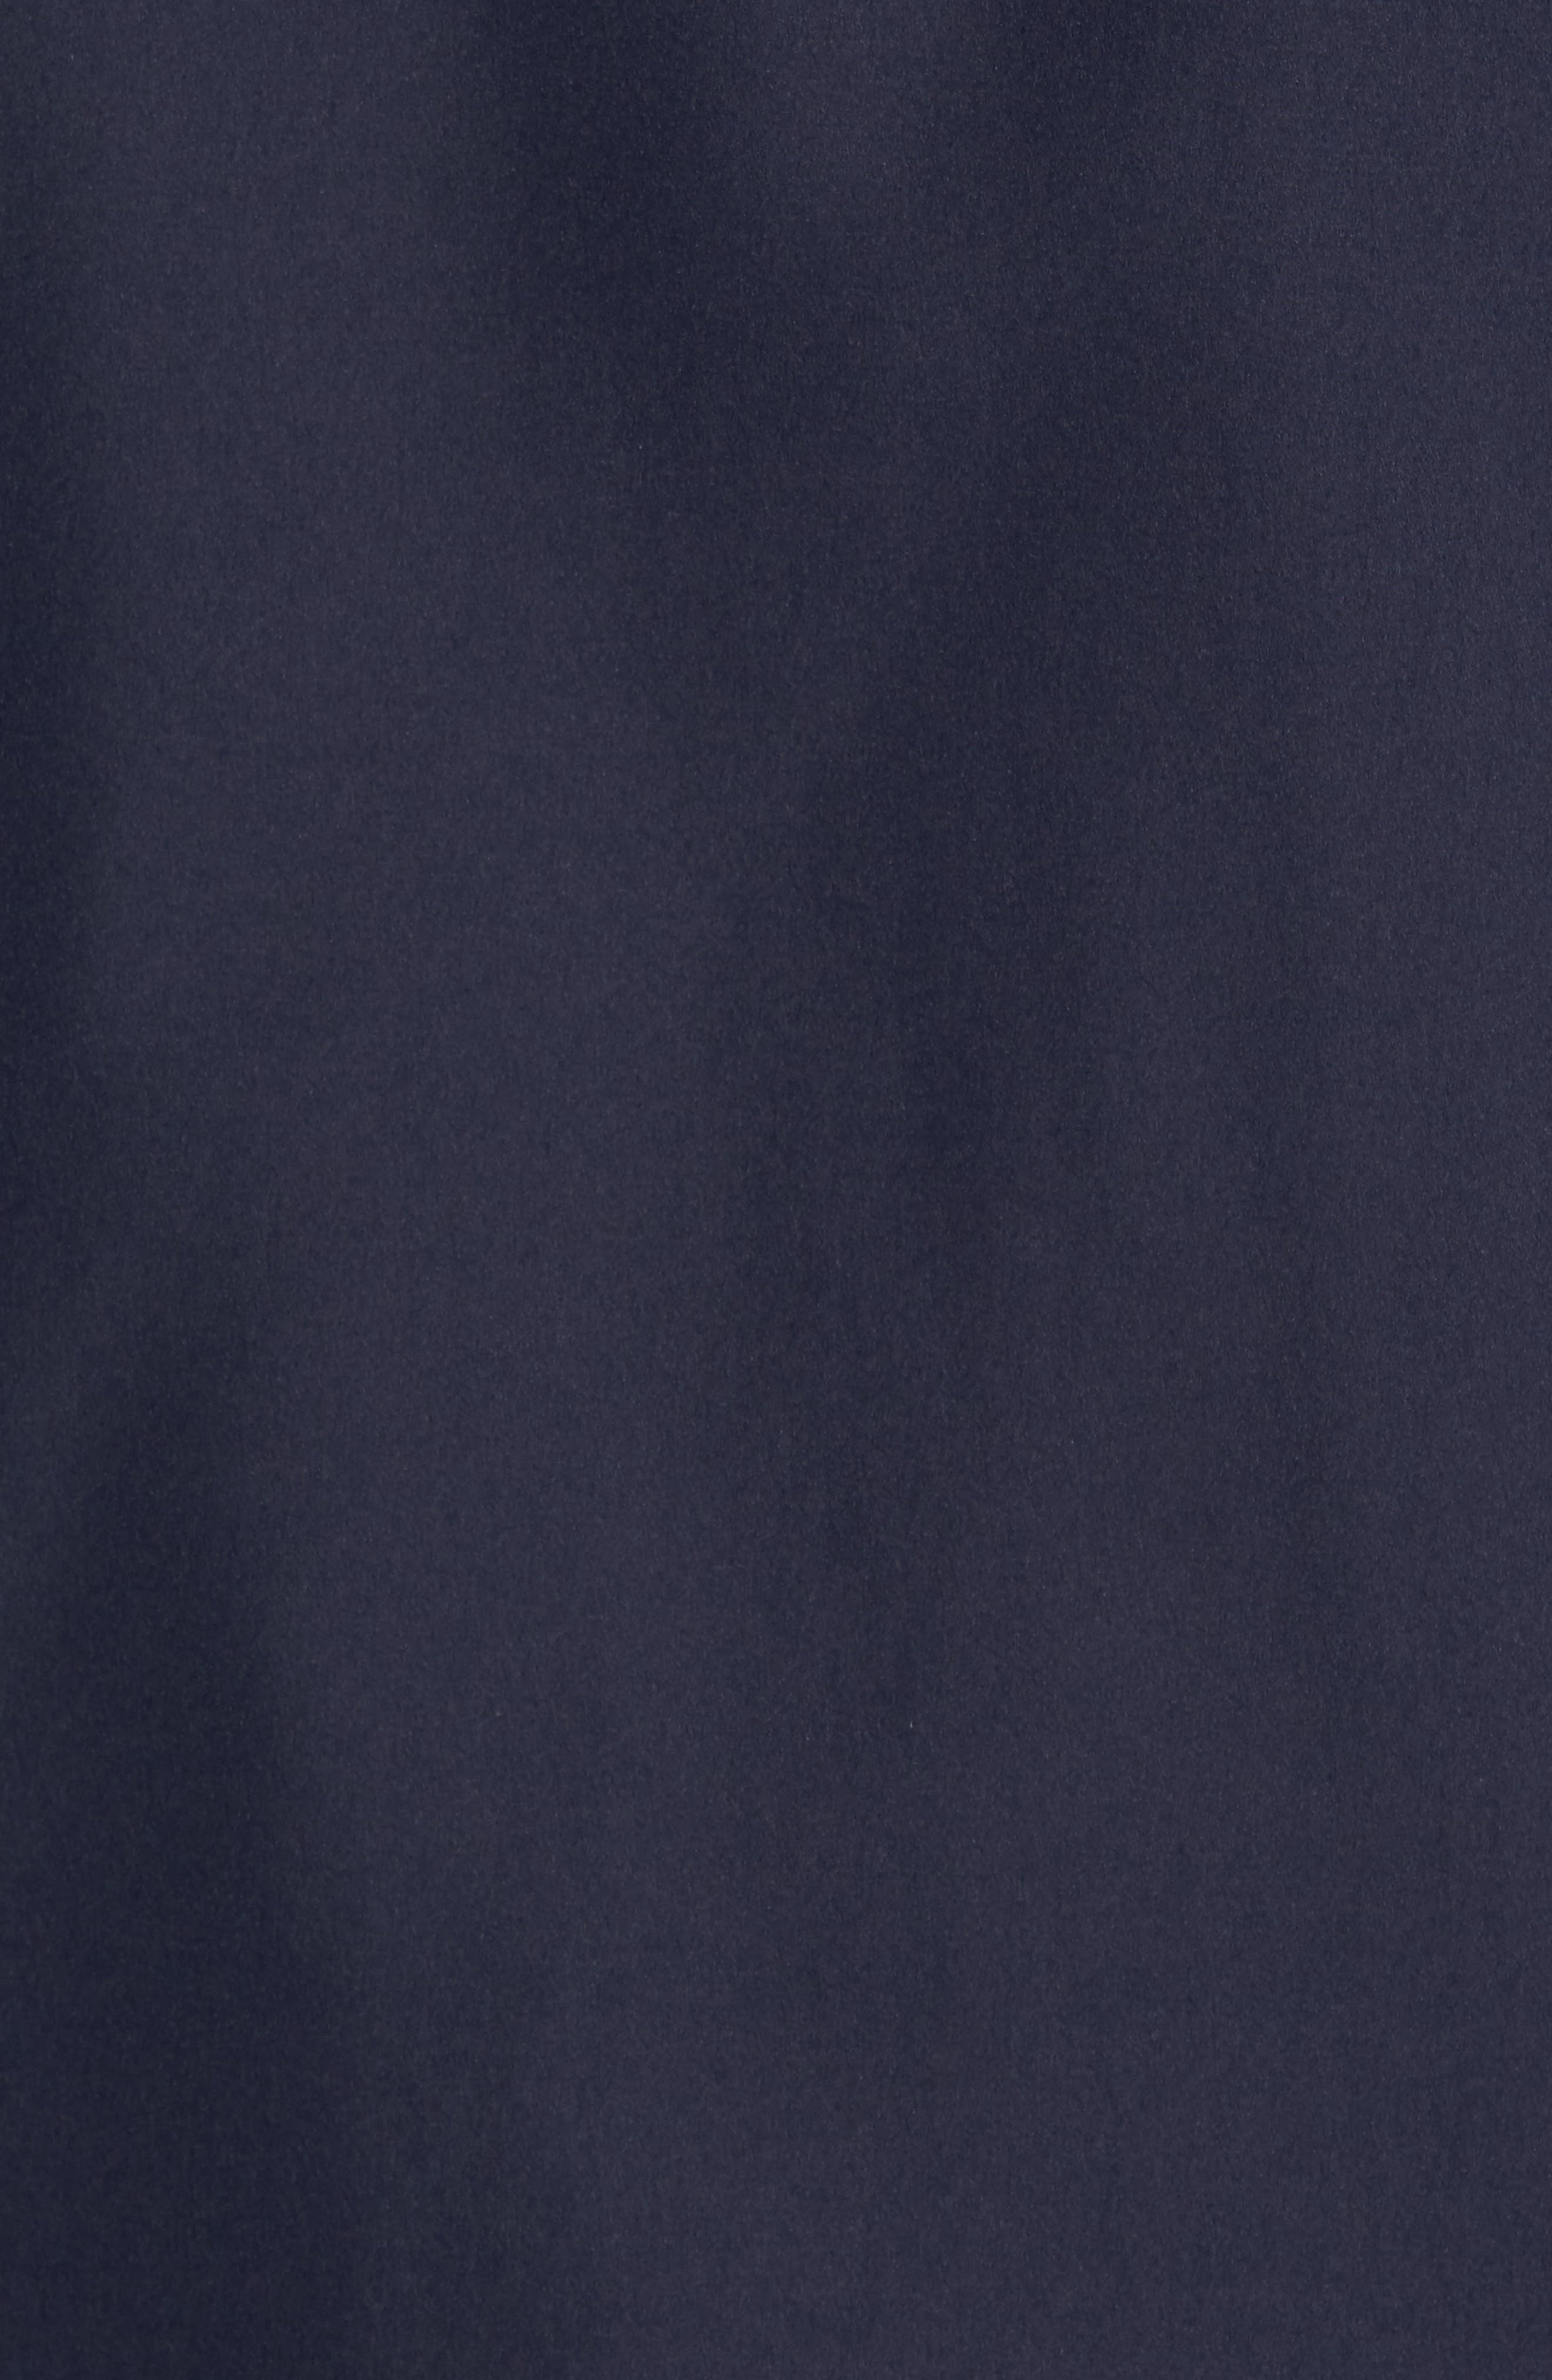 Paul&Shark Fleece Lined Hooded Jacket,                             Alternate thumbnail 6, color,                             400